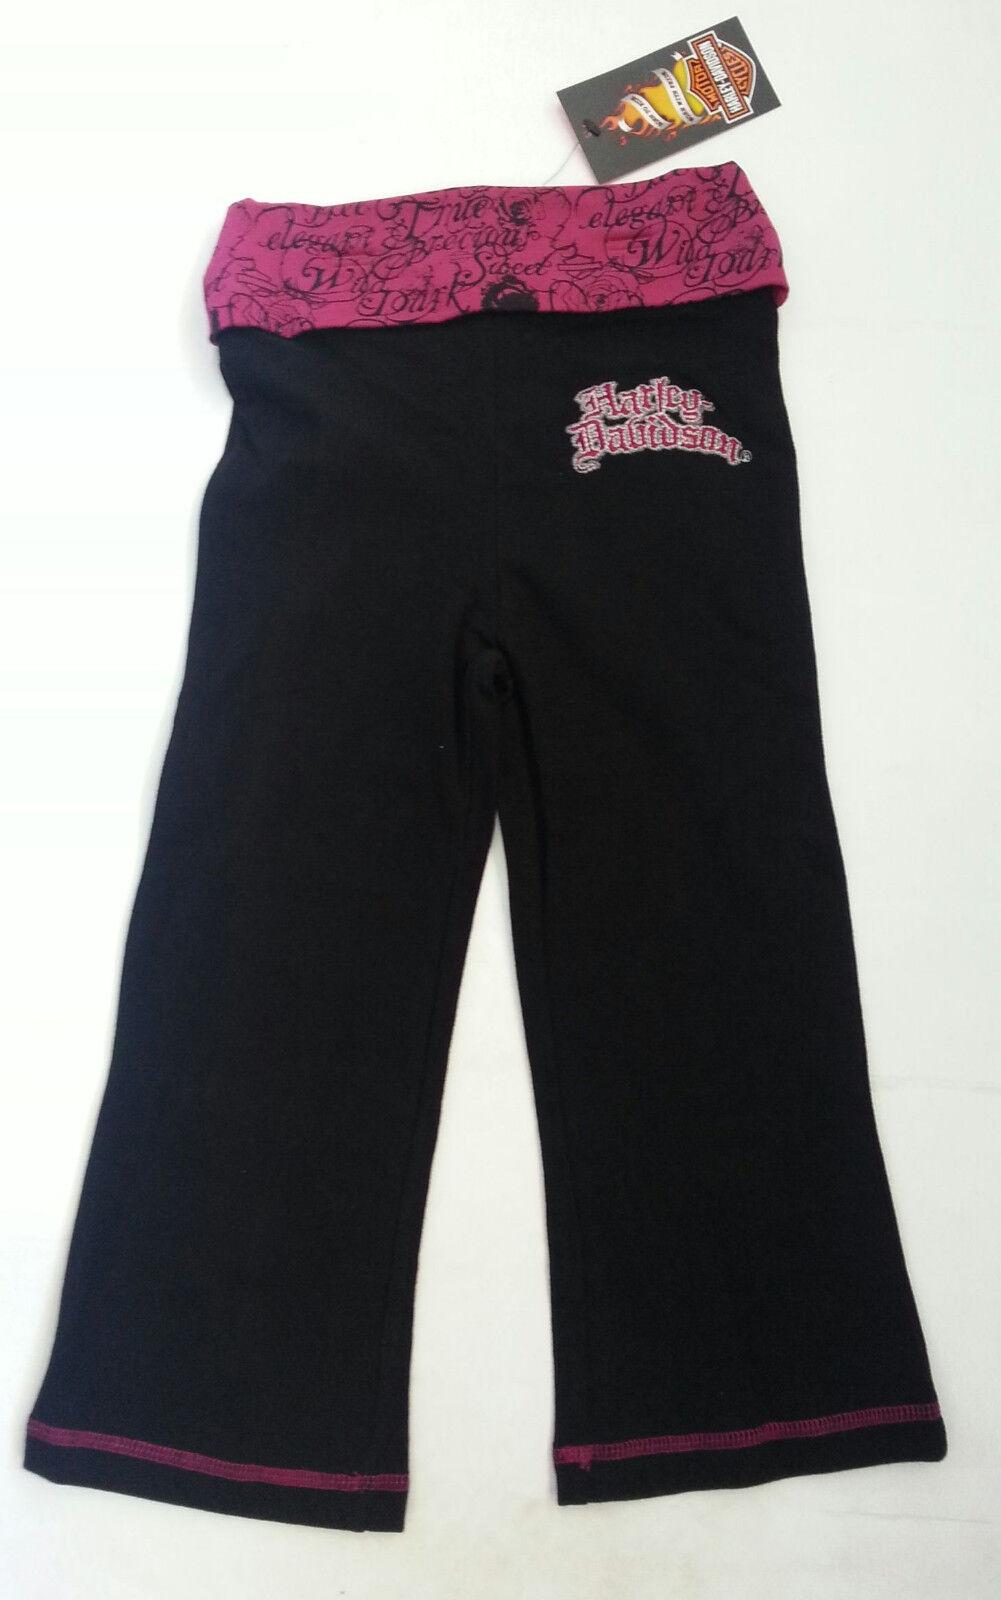 Girls Harley Davidson Yoga Pants - Kids Clothing - Apparel -